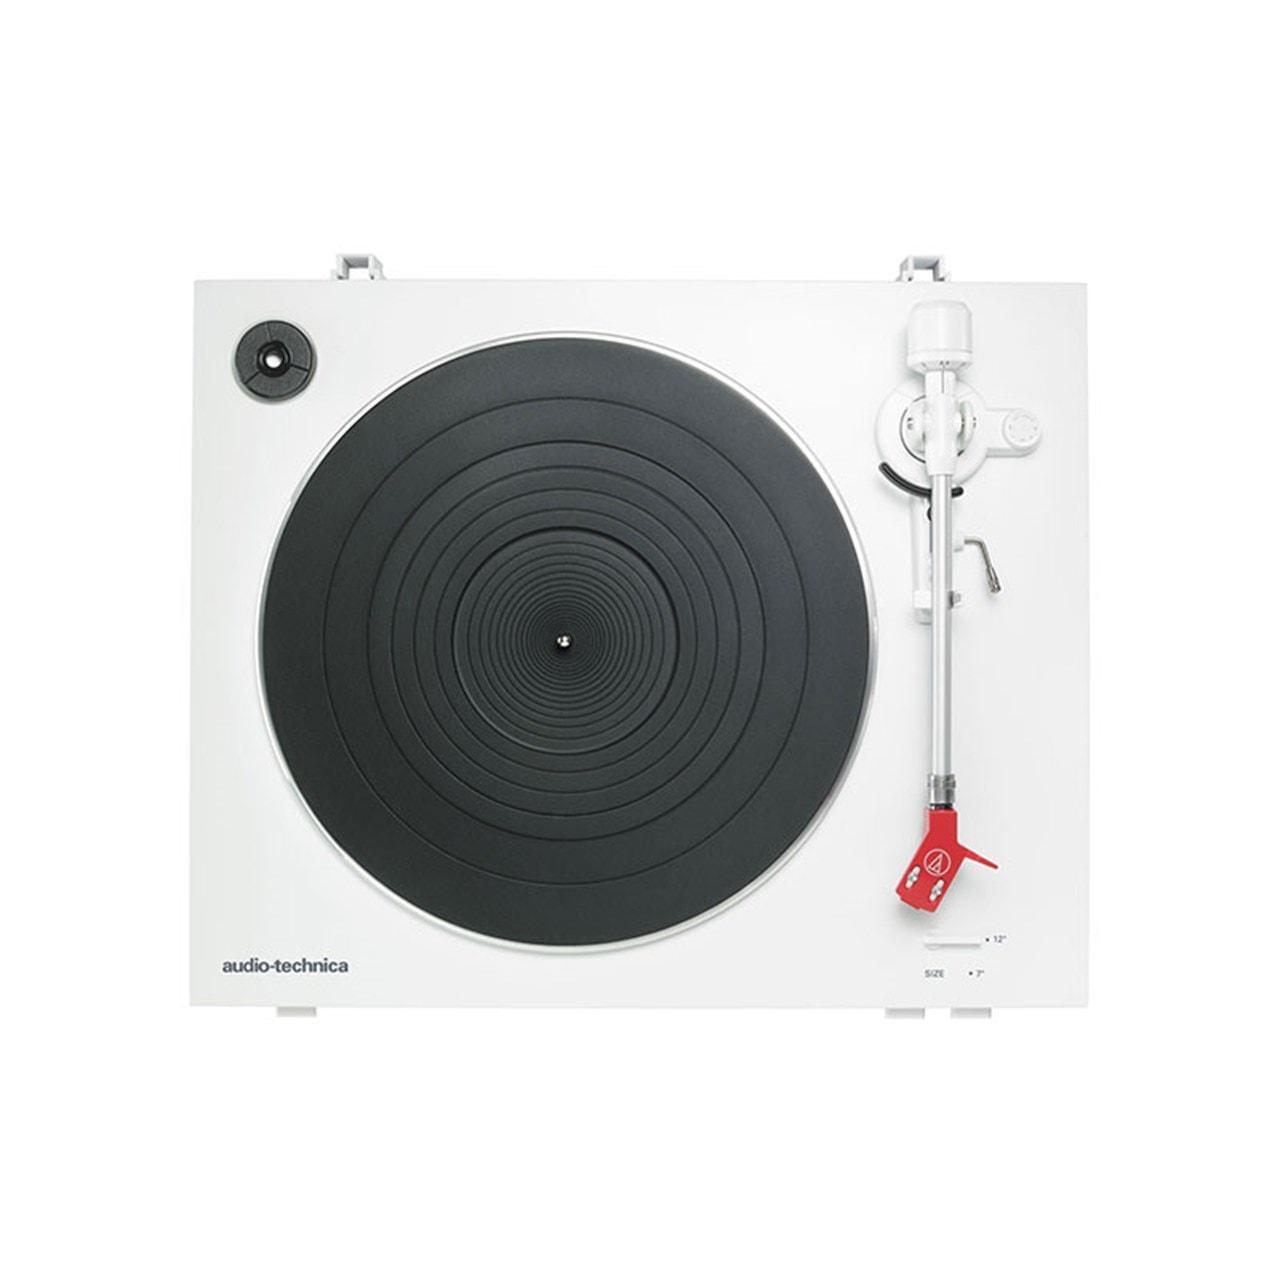 Audio Technica AT-LP3 White Turntable - 2